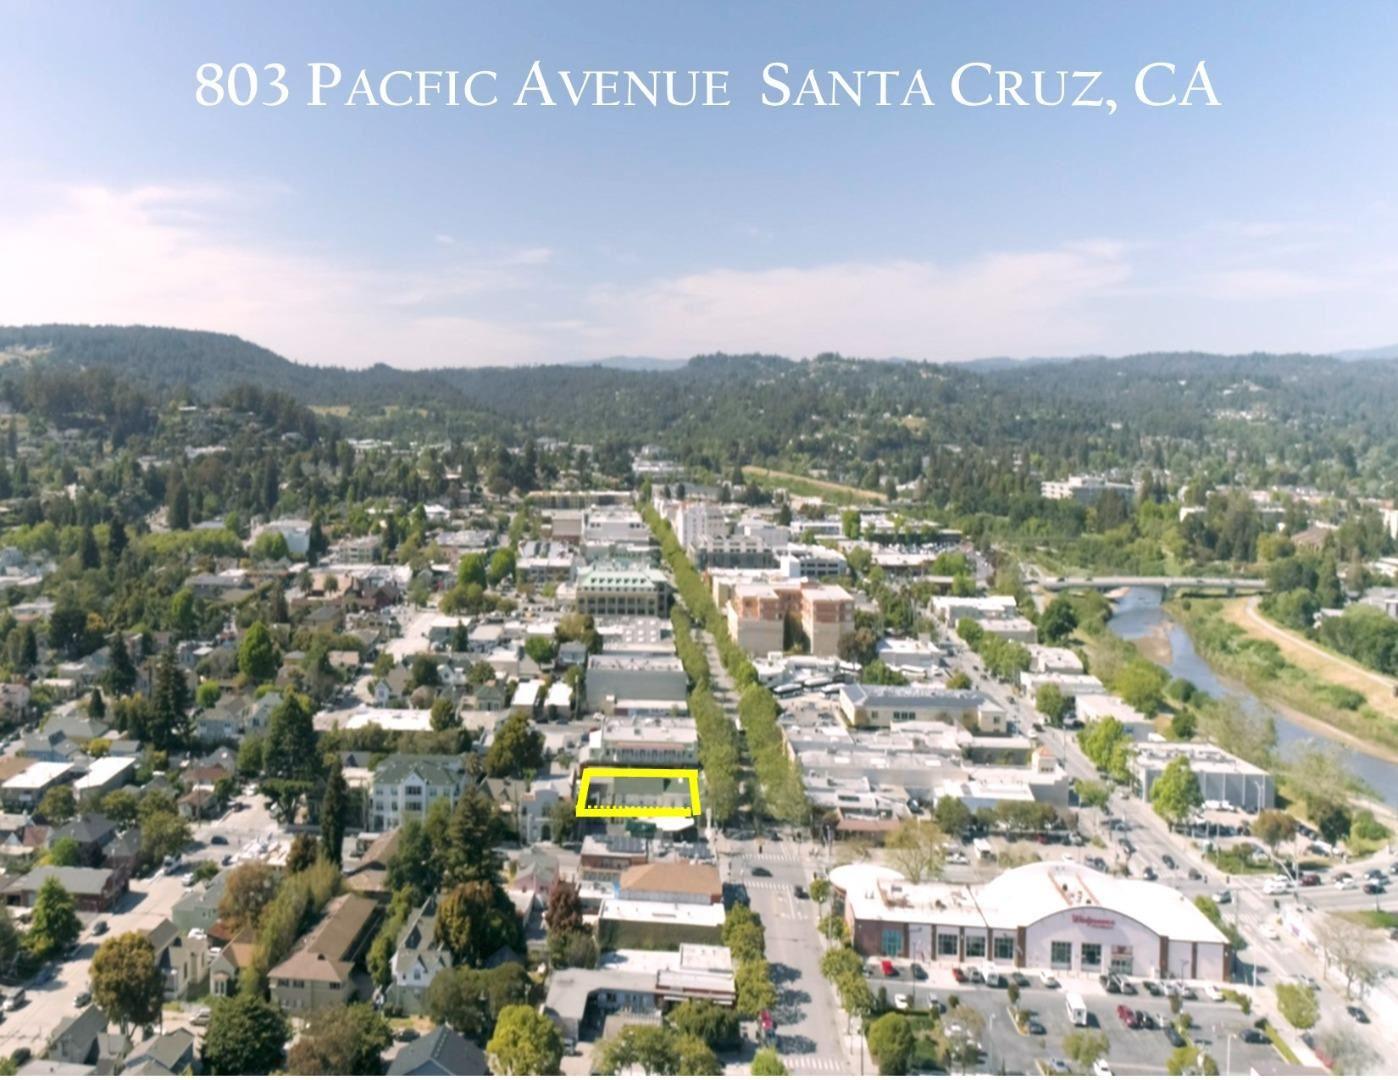 803 Pacific Avenue, Santa Cruz, CA 95060 - #: ML81840804